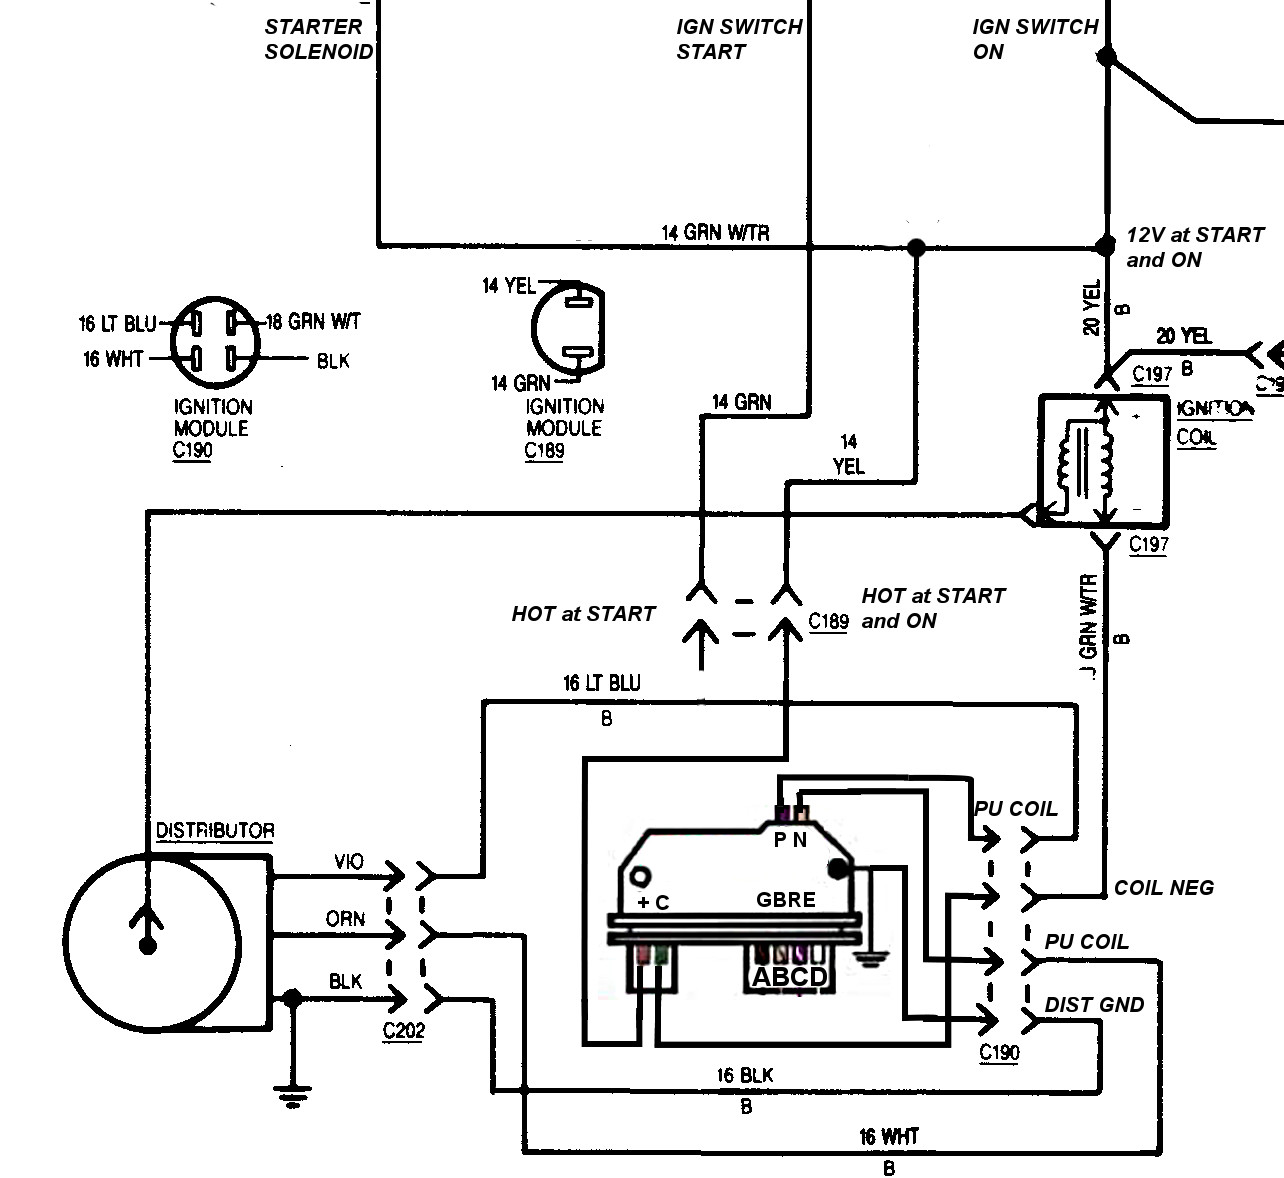 Ignition Module Diagram | Wiring Diagram Database on gm hei numbers, gm tachometer wiring diagram, chevy alternator wiring diagram, gm hei module, distributor wiring diagram, gm wiring diagrams automotive, 1977 chevy truck wiring diagram, gm starter solenoid diagram, gm hei ignition coil, hei coil diagram, sbc alternator wiring diagram, gm hei wiring schematic, 1967 chevelle wiper motor wiring diagram, chevy starter wiring diagram, resistor wiring diagram, gm distributor diagram, hei ignition parts diagram, 1967 camaro wiring diagram, hei conversion wiring diagram, gm hei cap firing order,